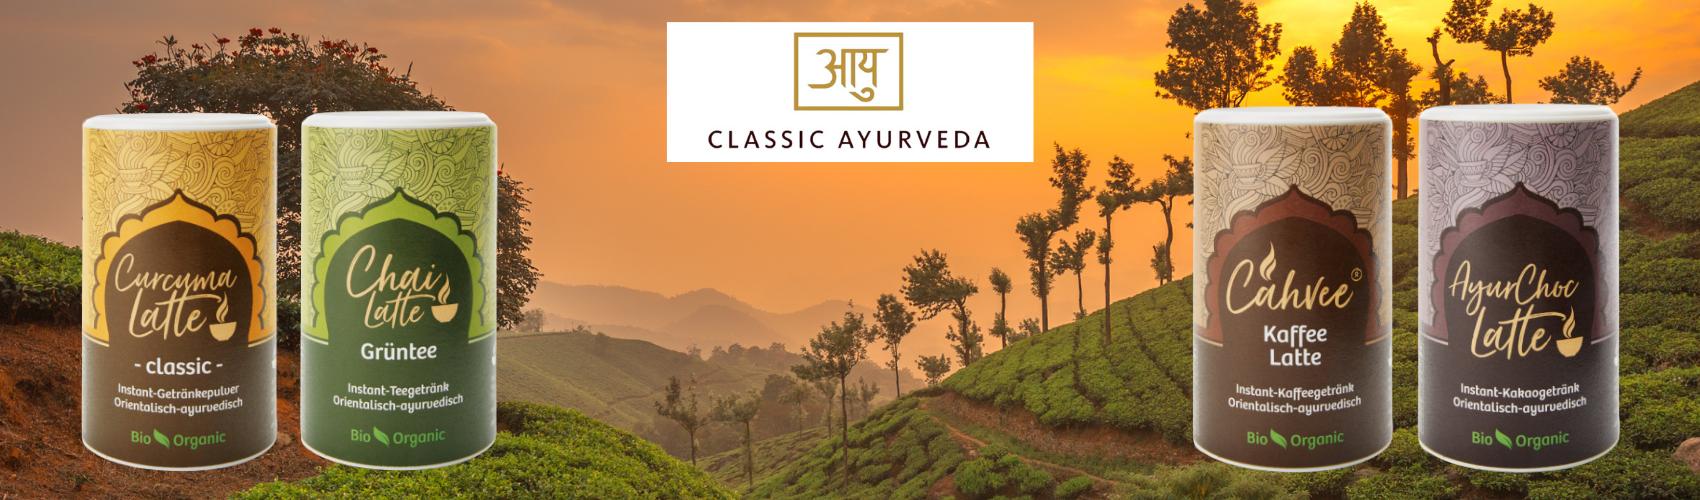 Classic Ayurveda Chai Serie 2021